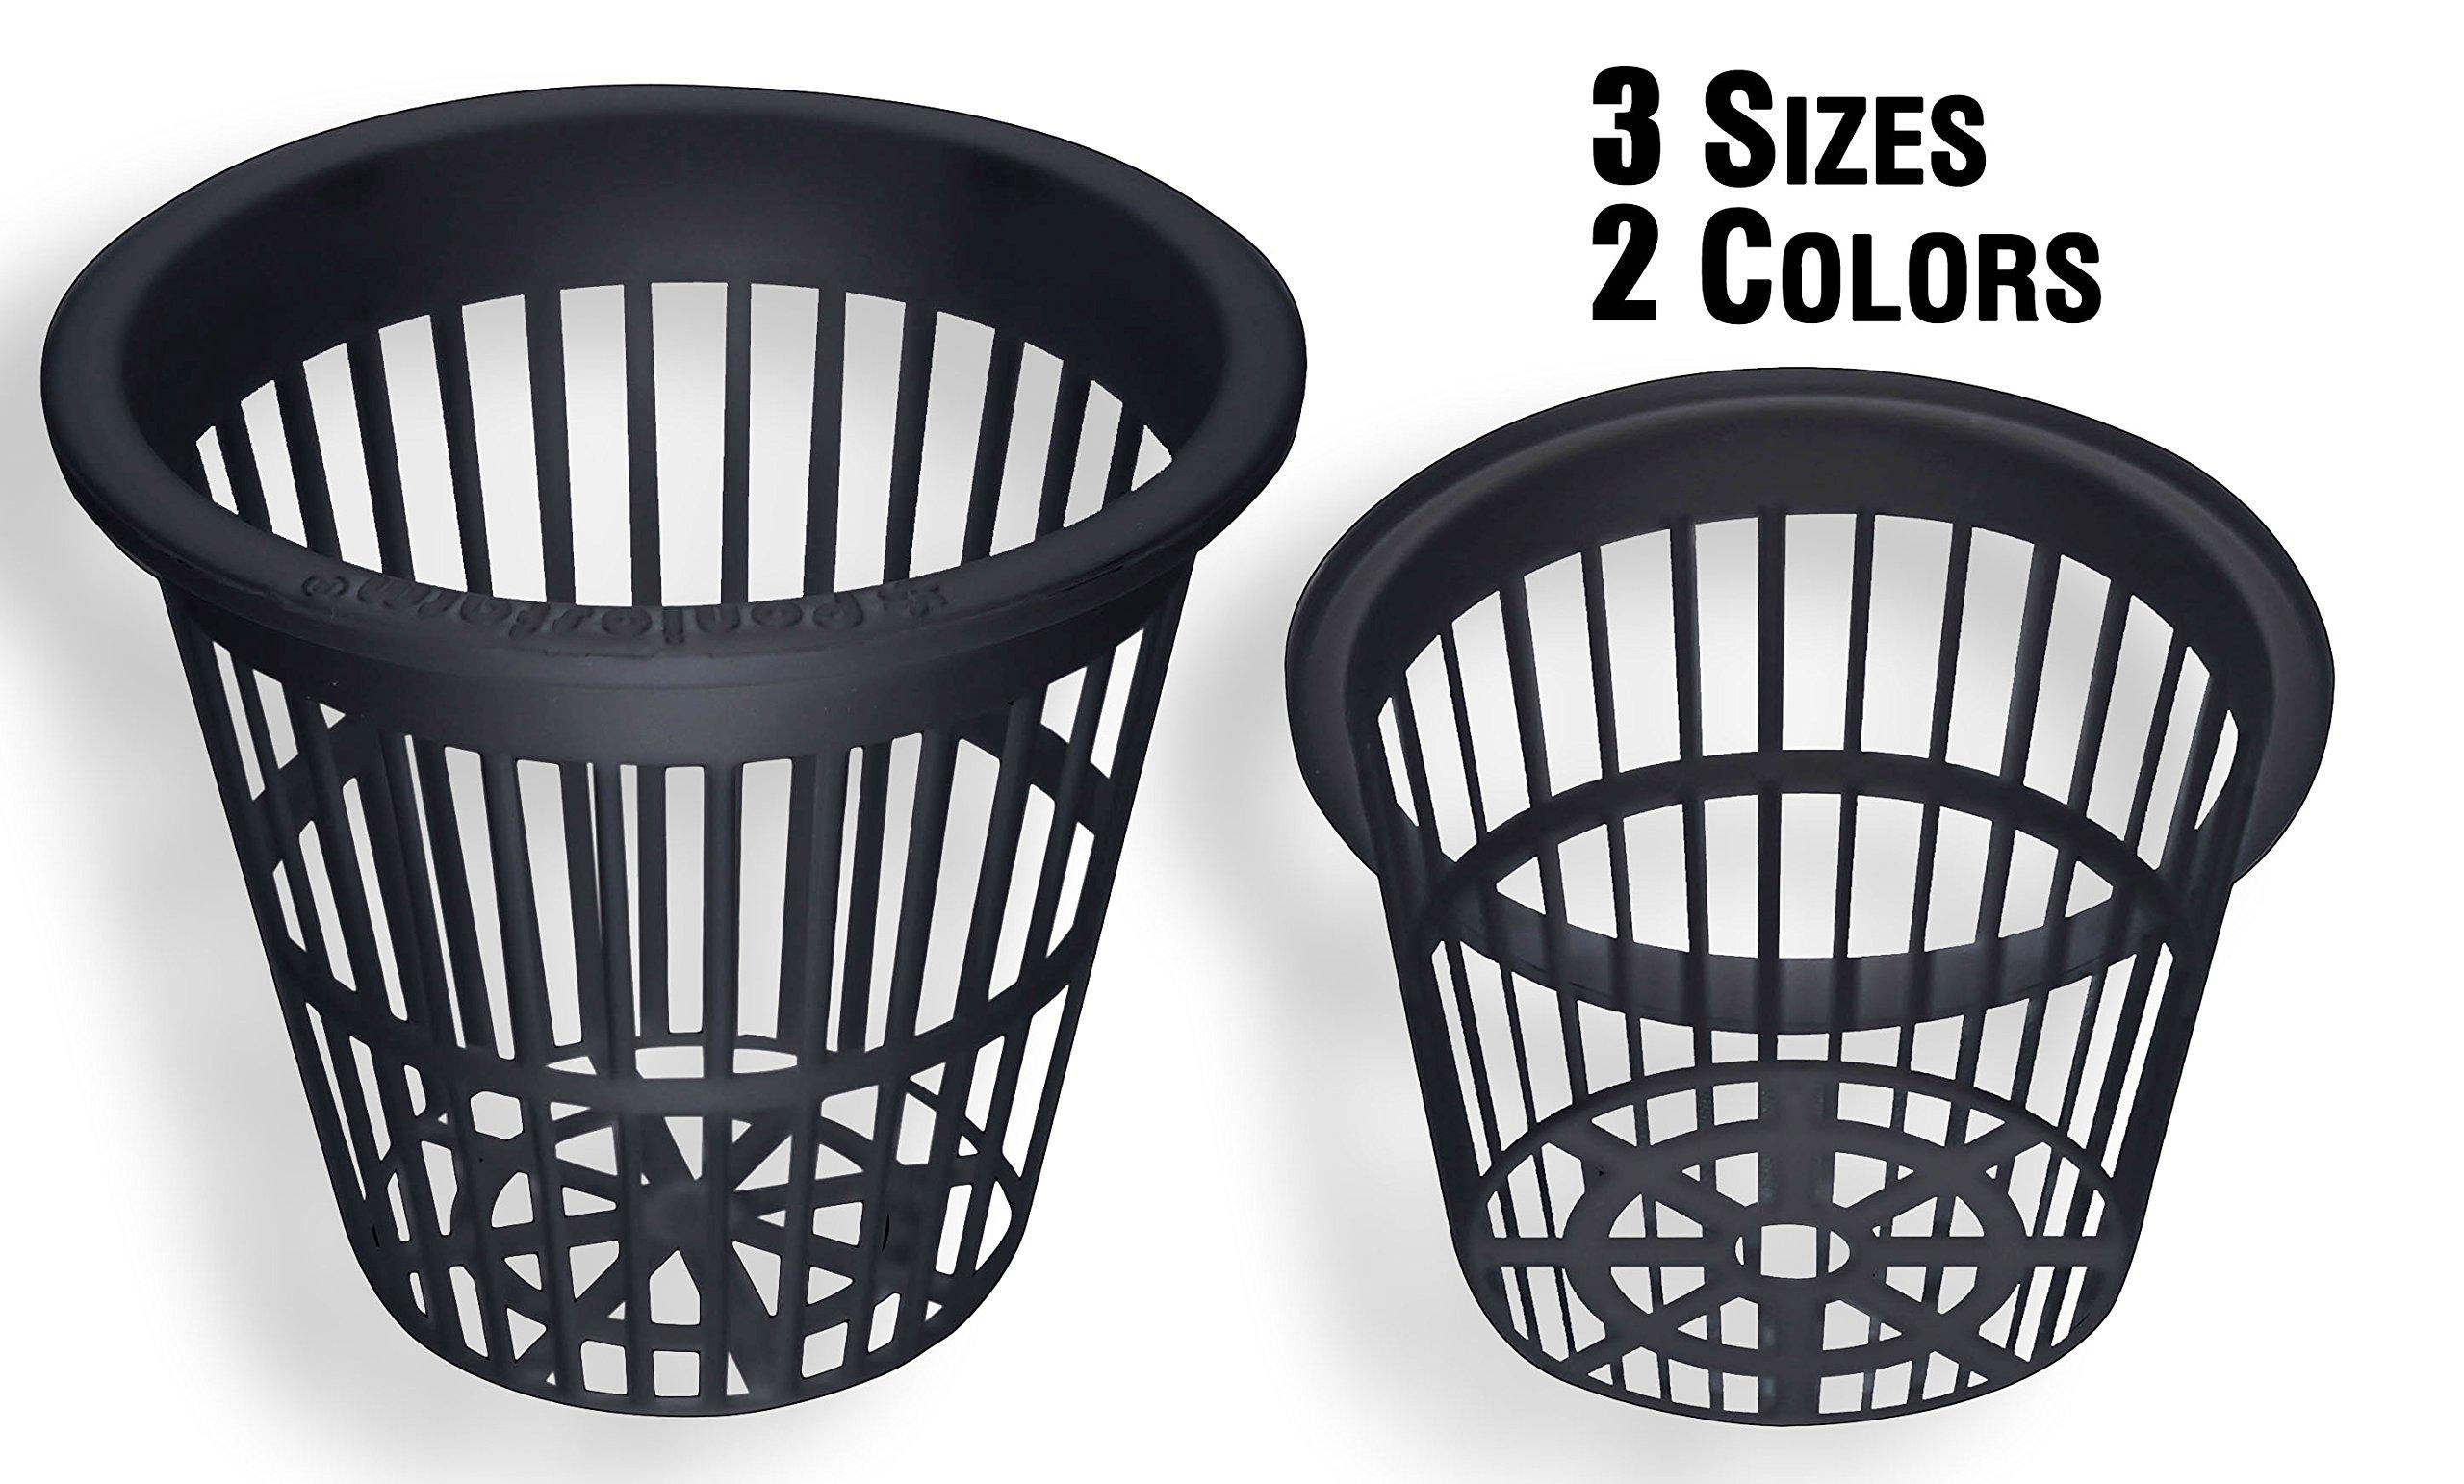 NP3CB: 3 Inch Black Slotted Mesh Net Pot for Hydroponics/Aquaponics/Orchids - 300 Carton